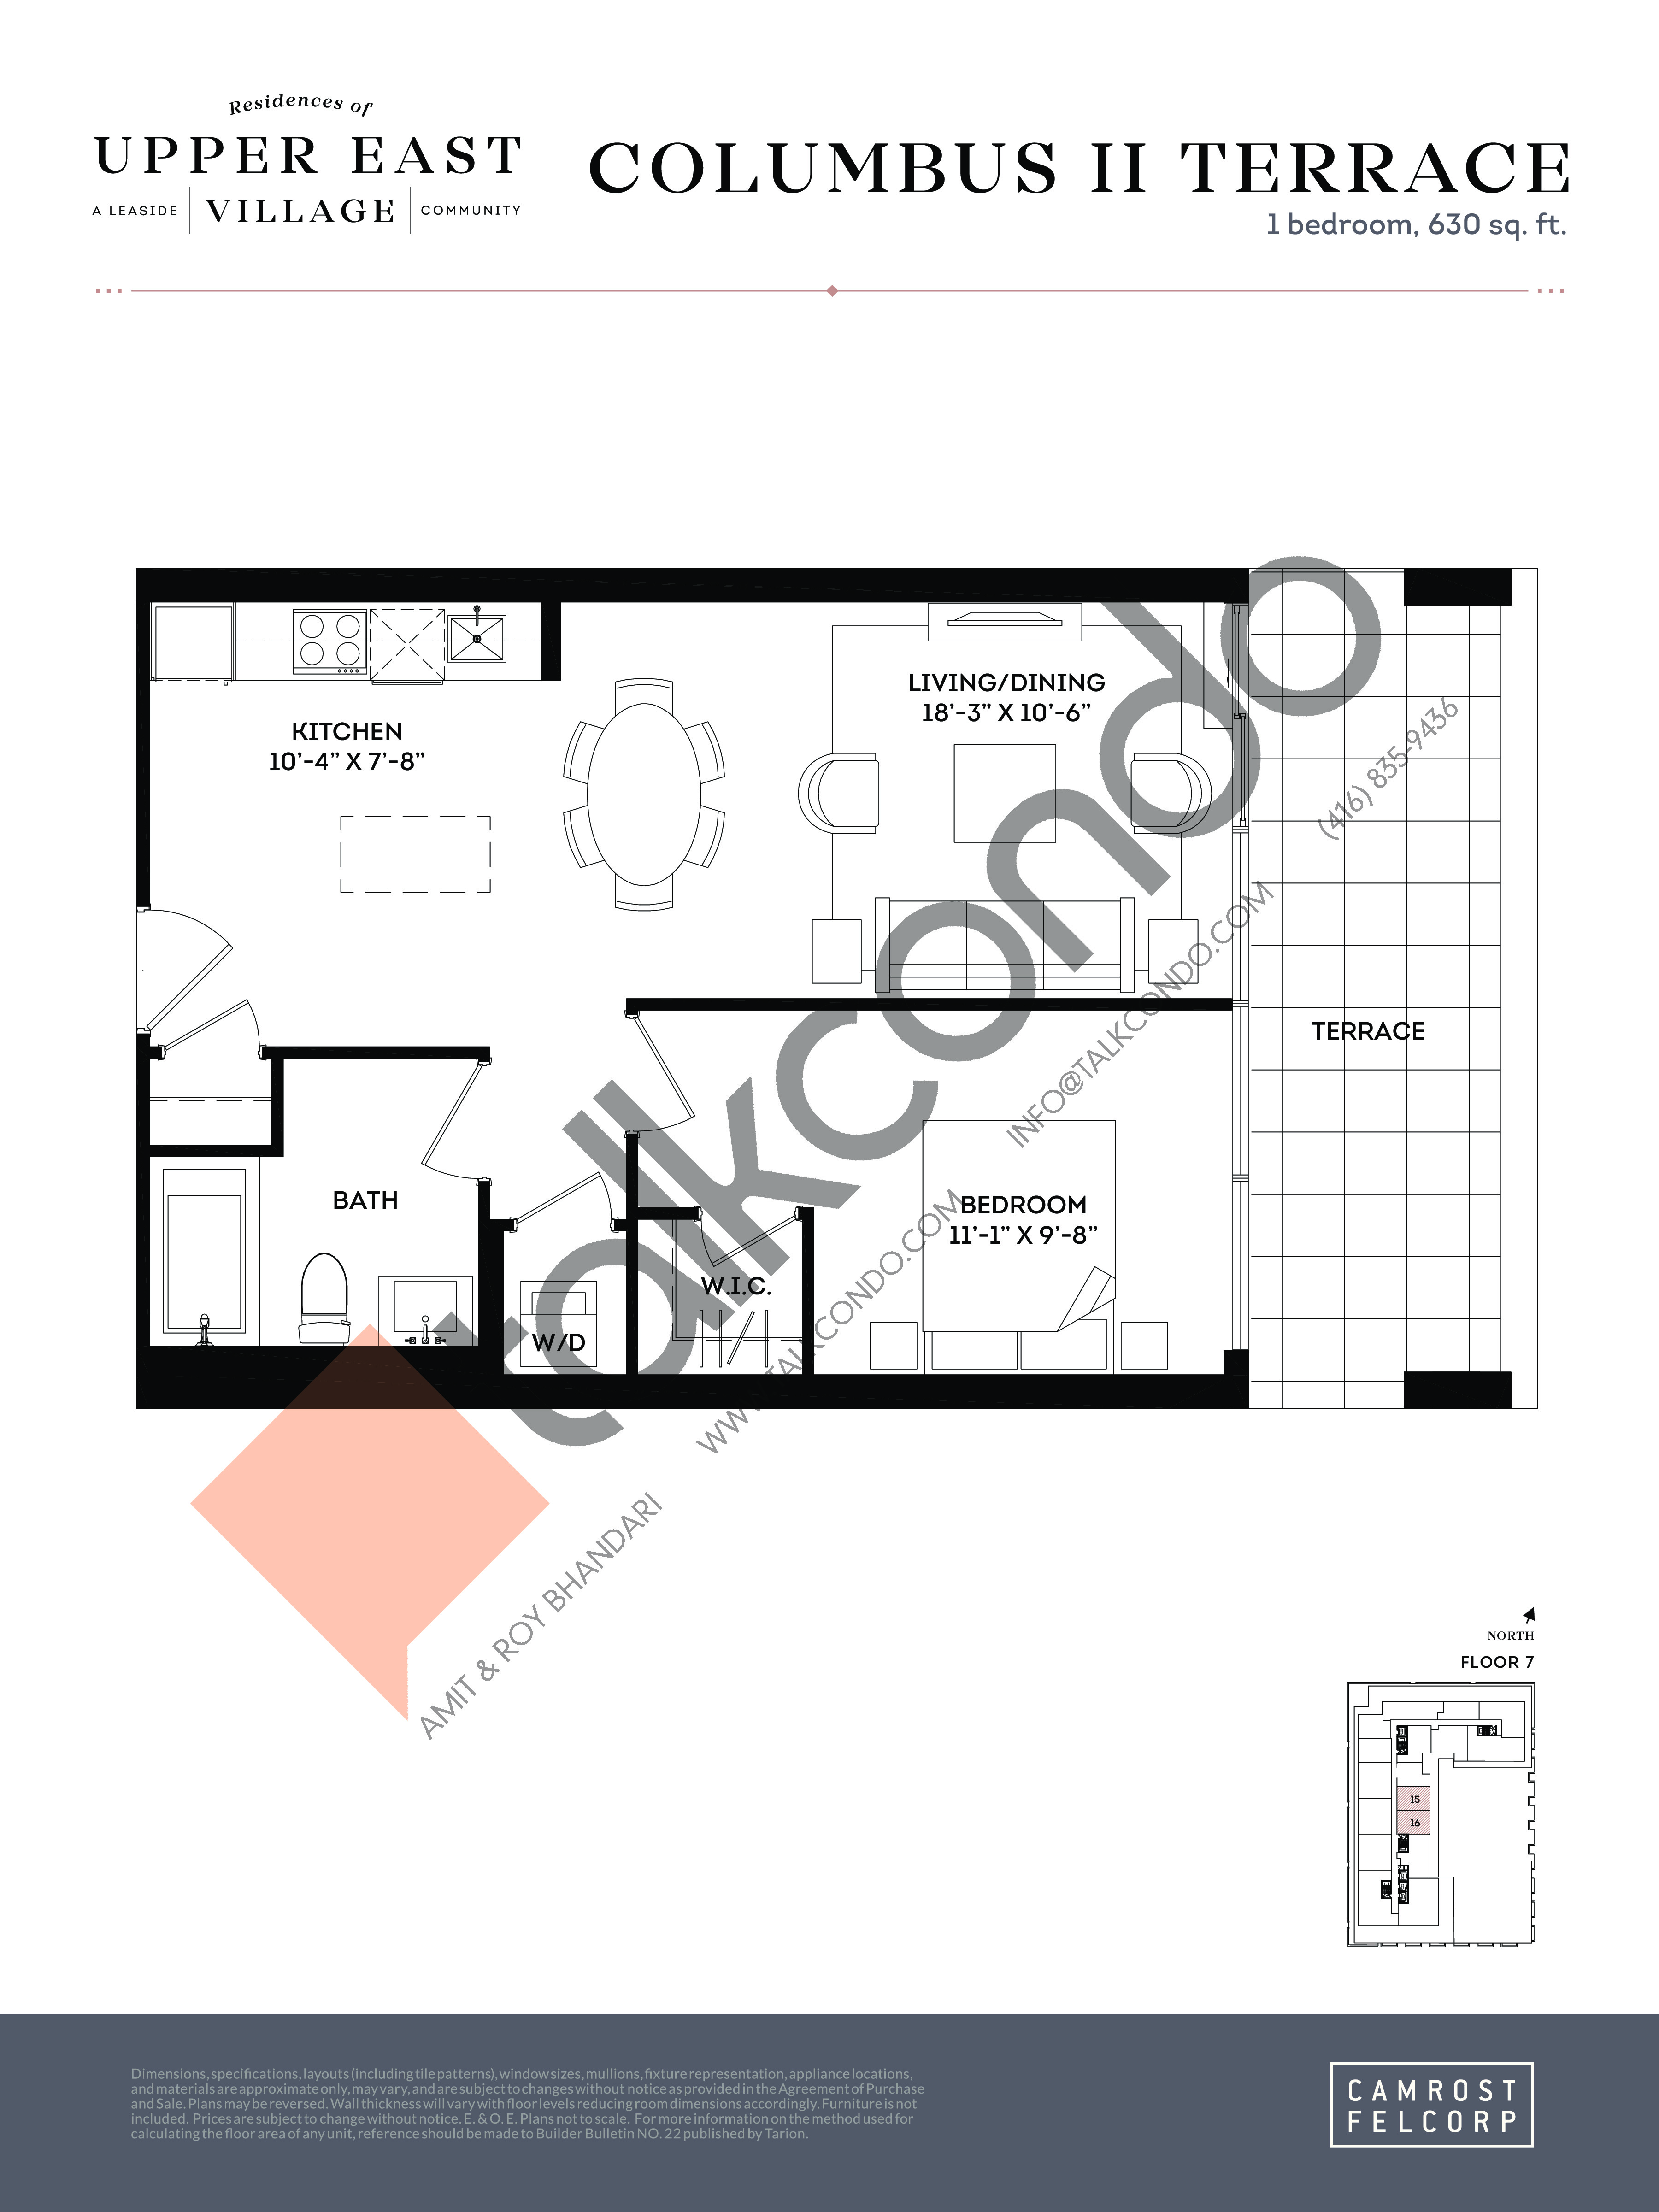 Columbus II Terrace Floor Plan at Upper East Village Condos - 630 sq.ft